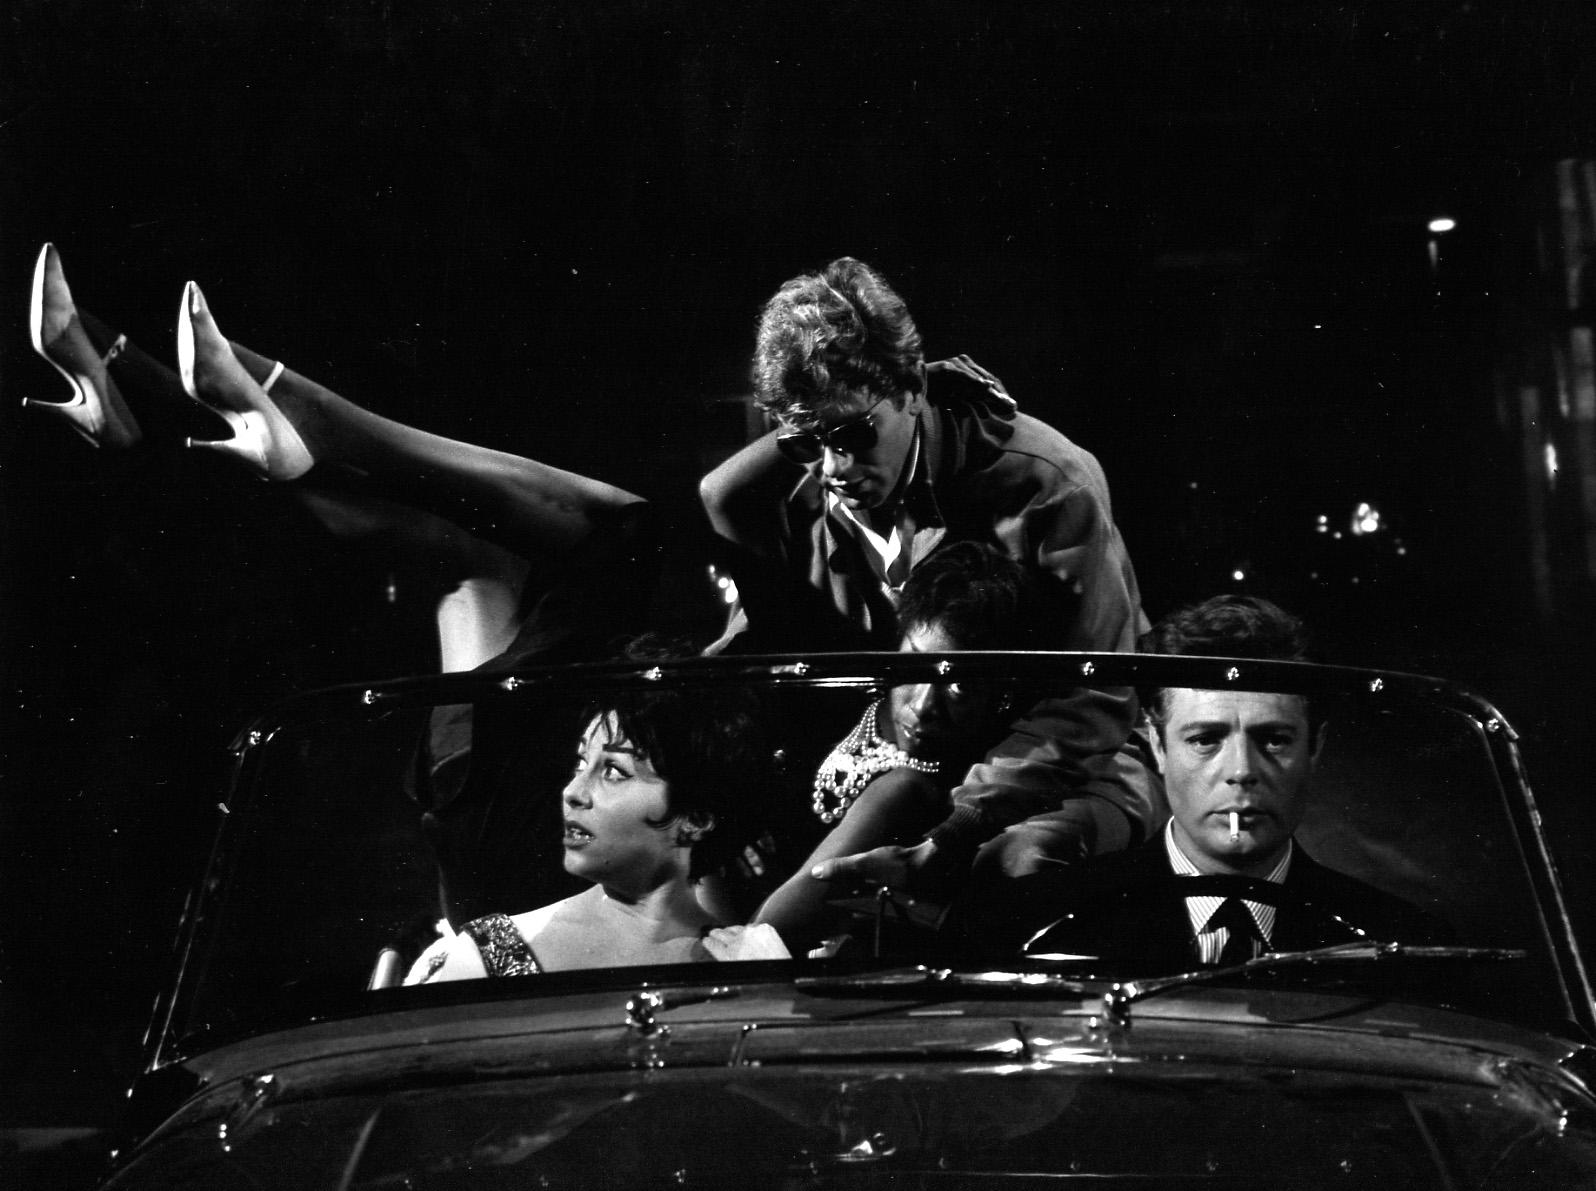 Bopenminded Dolce Vita Lifestyle La Dolce Vita: World Cinema Review: Federico Fellini